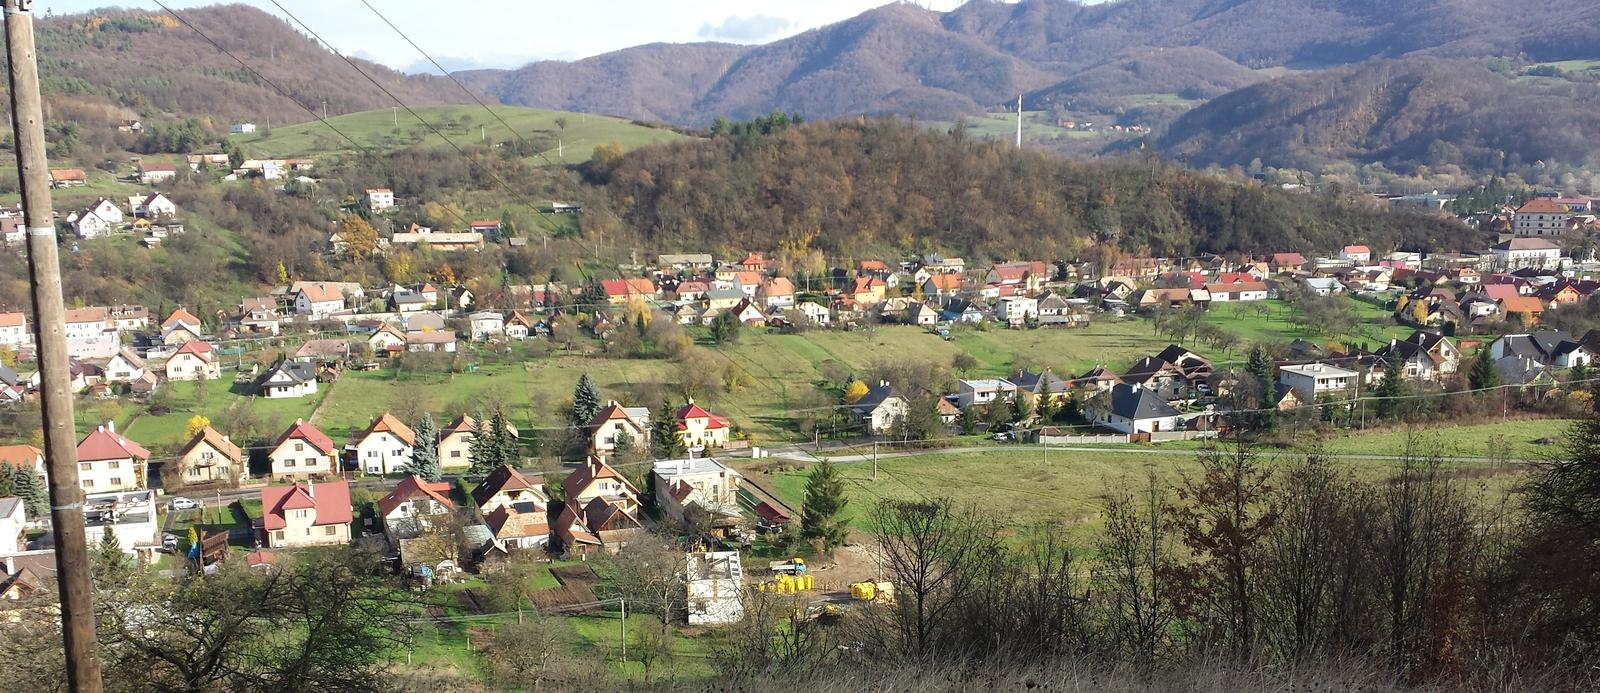 Pasívny dom svojpomocne - Natocenie domu na juhovychod, pretoze na juhu tieni kopec.